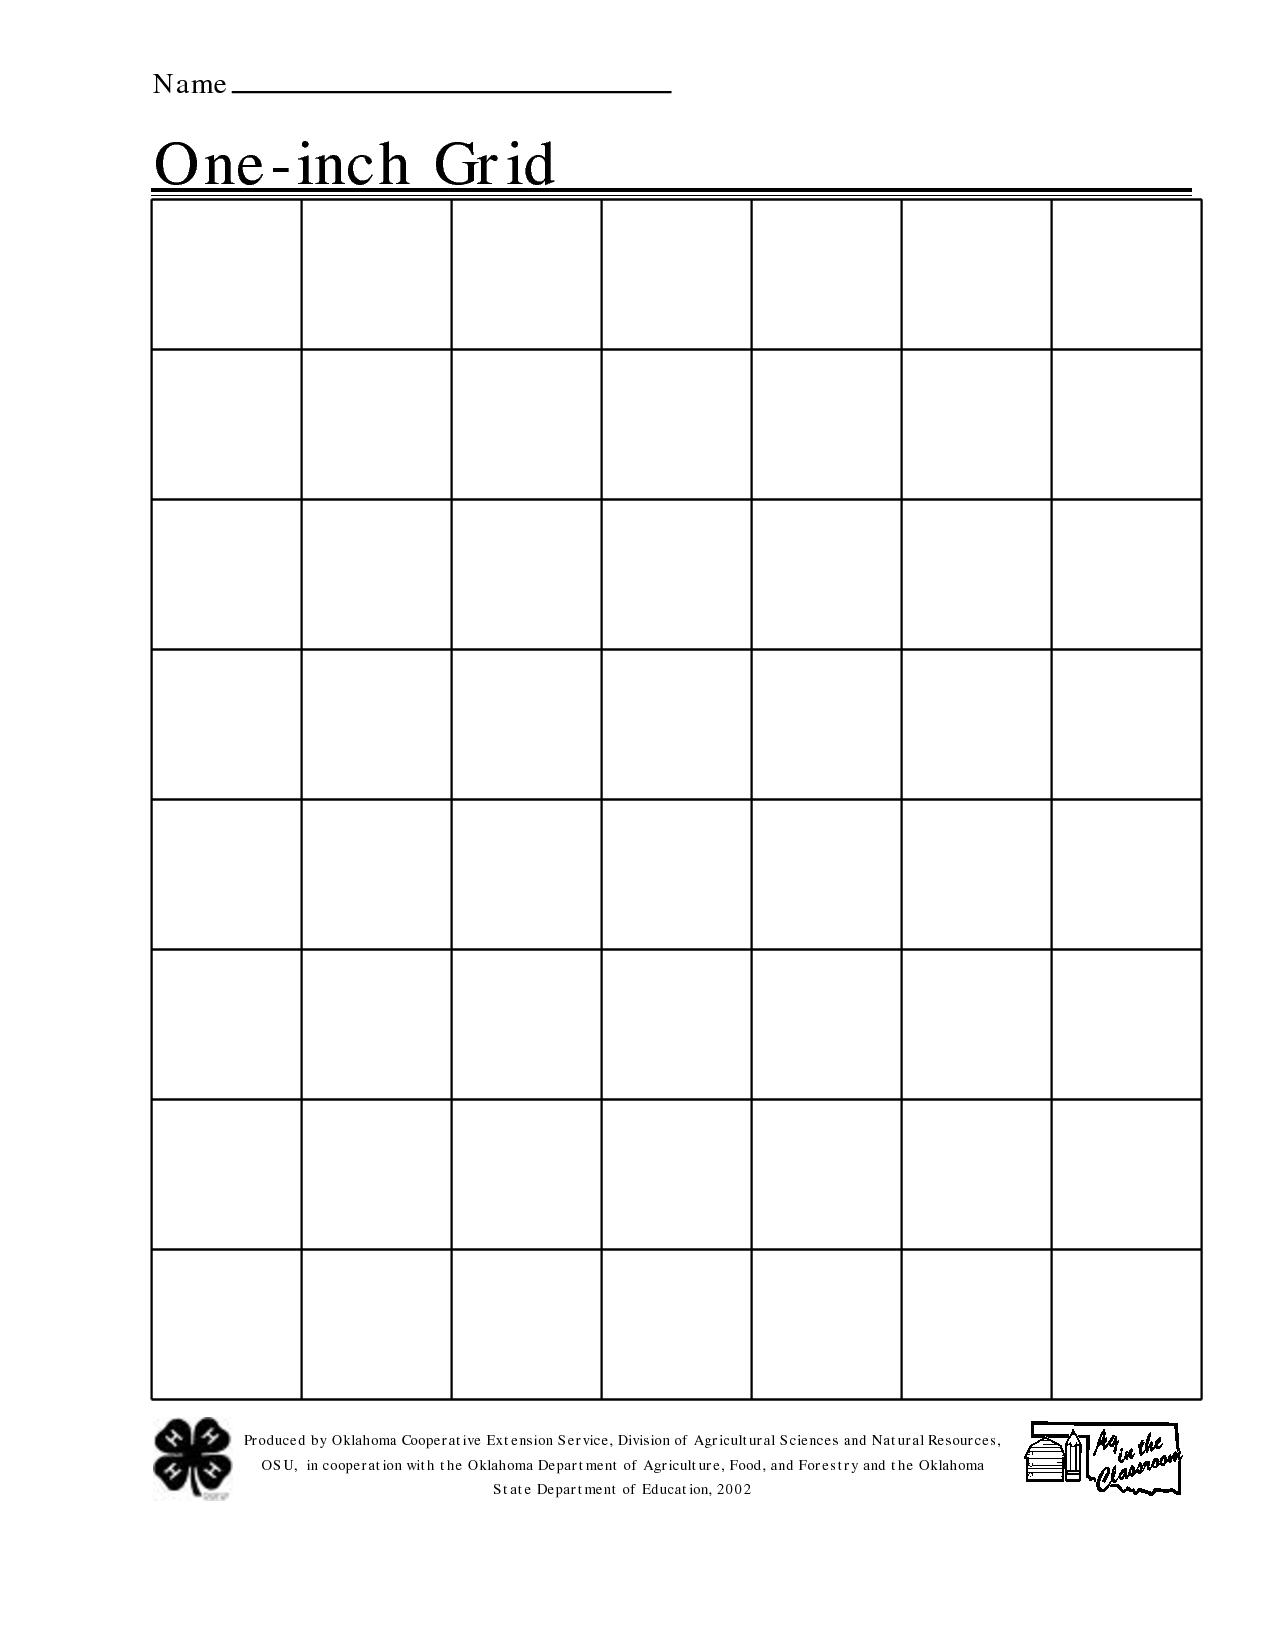 Free Printable 1 Inch Grid Paper | Math | Printable Graph Paper - One Inch Stencils Printable Free